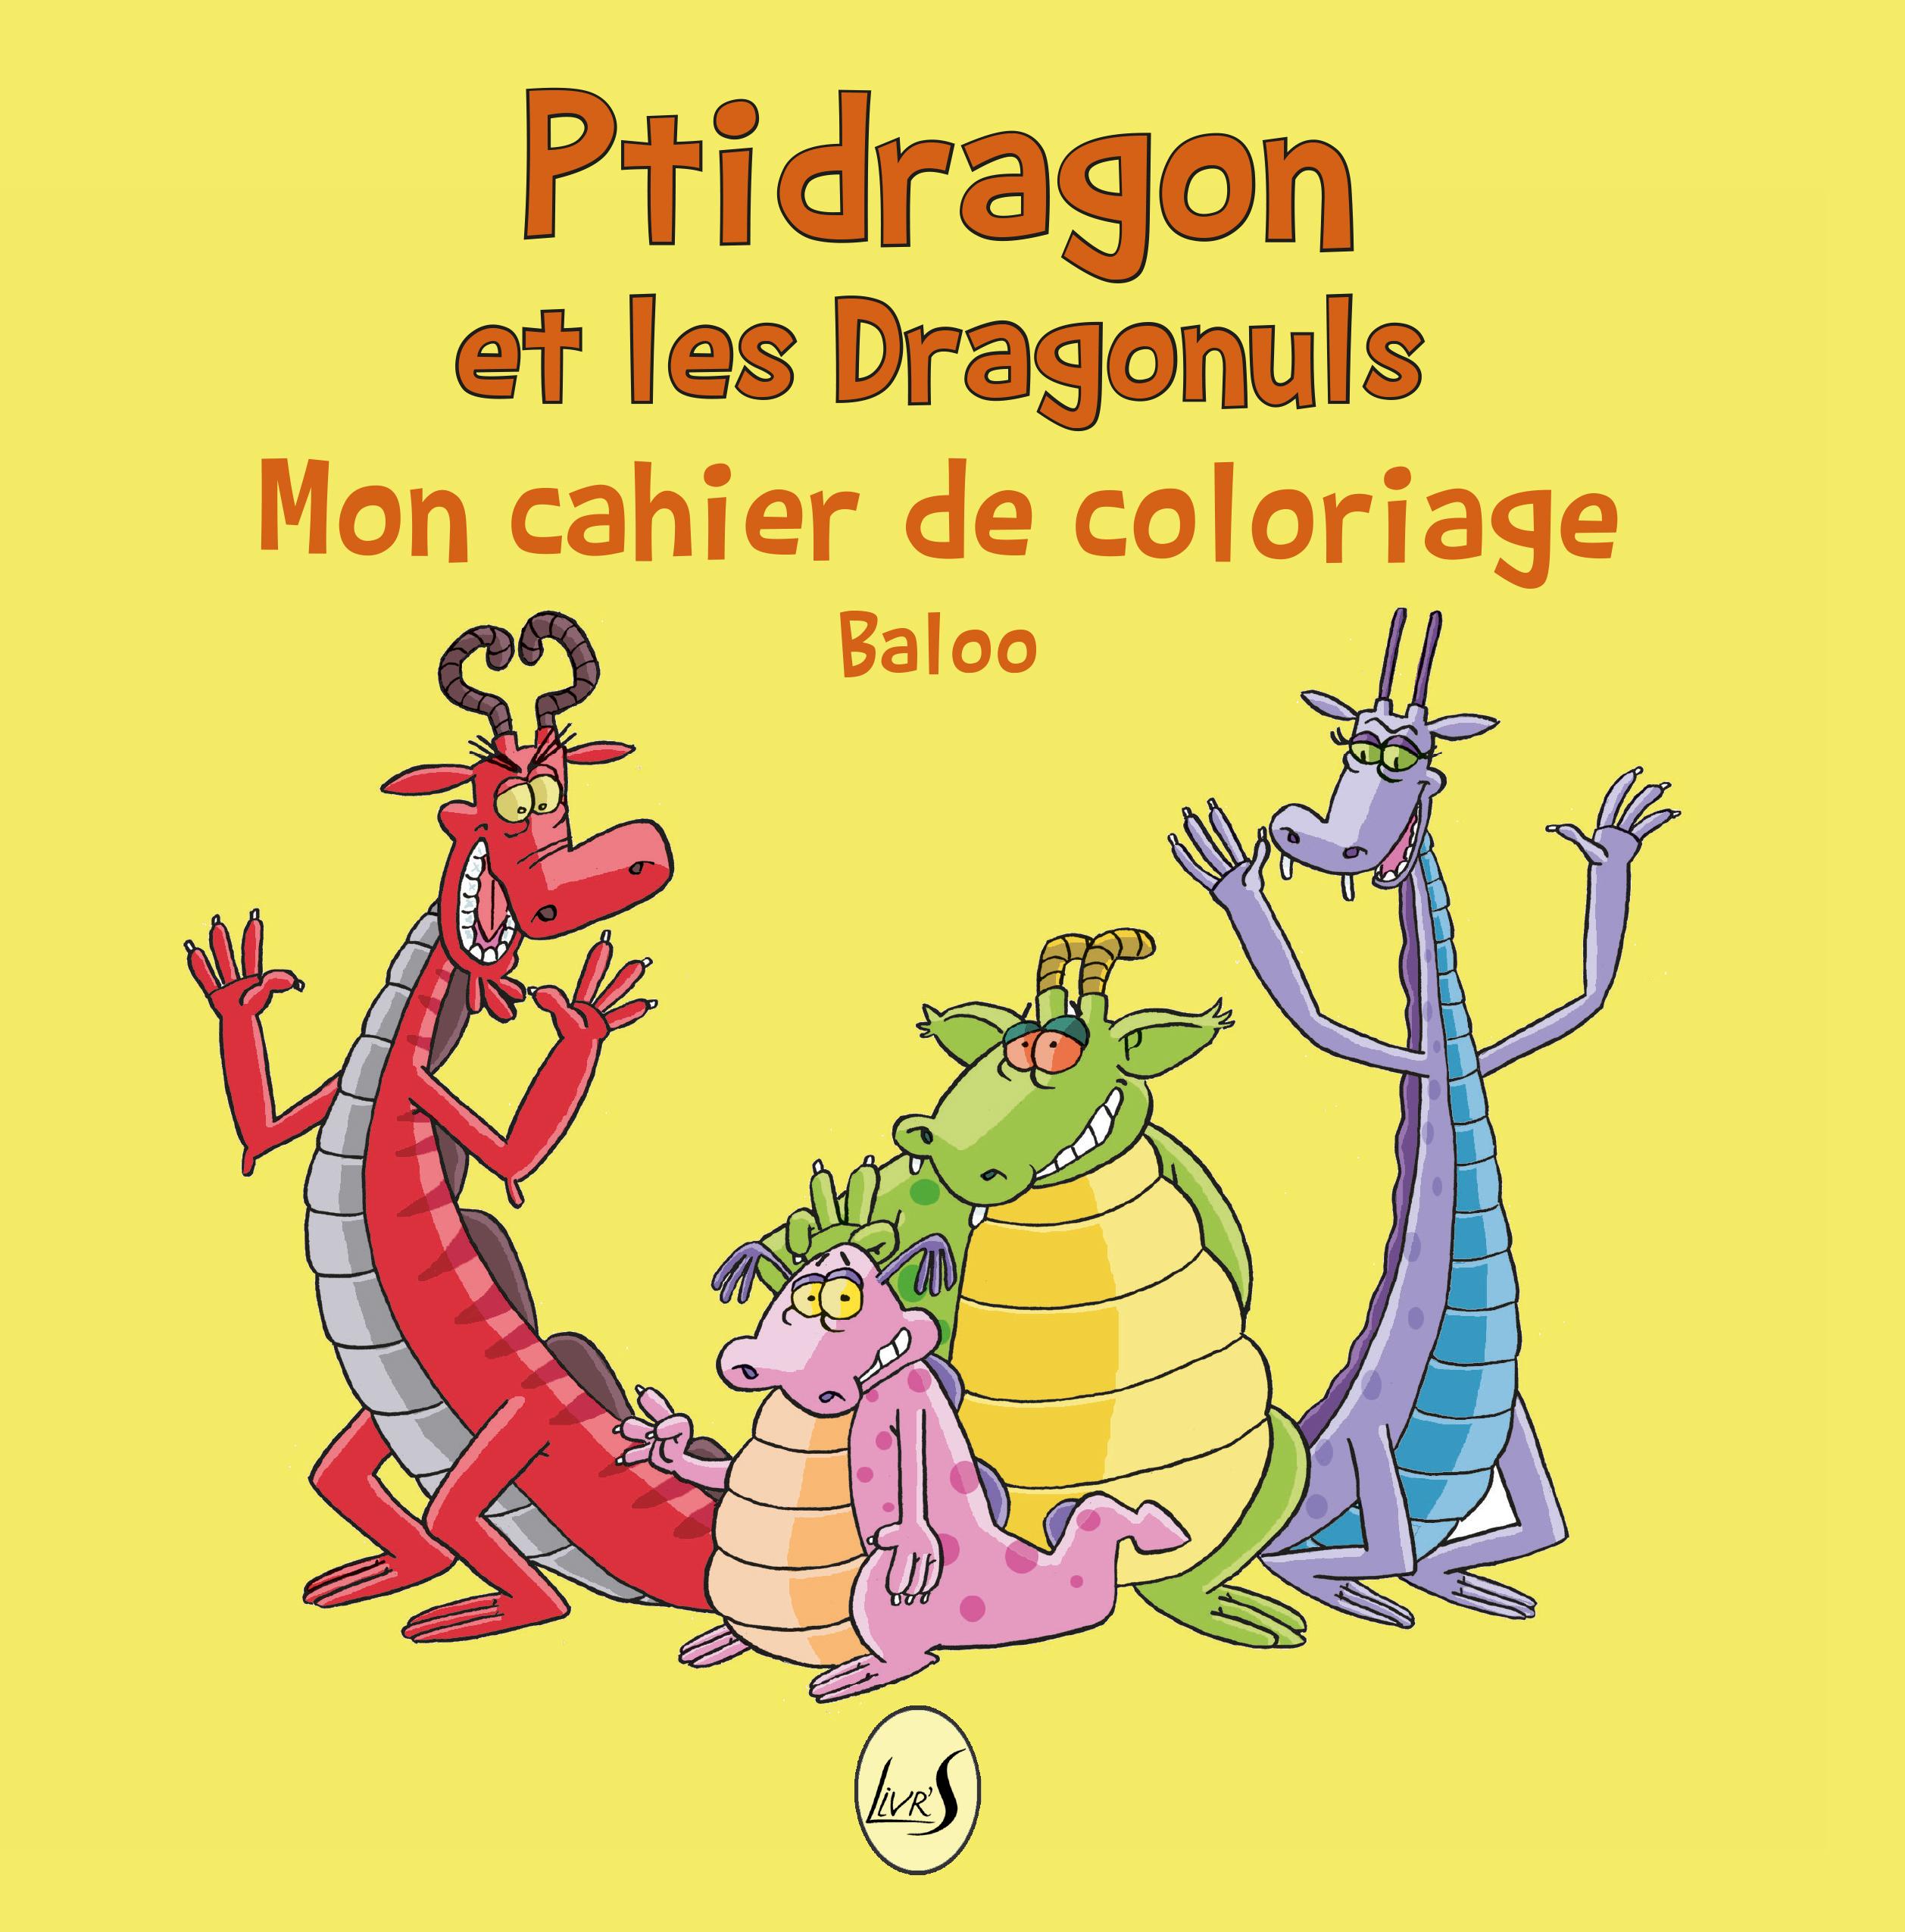 Pridragon et les dragonuls coloriage